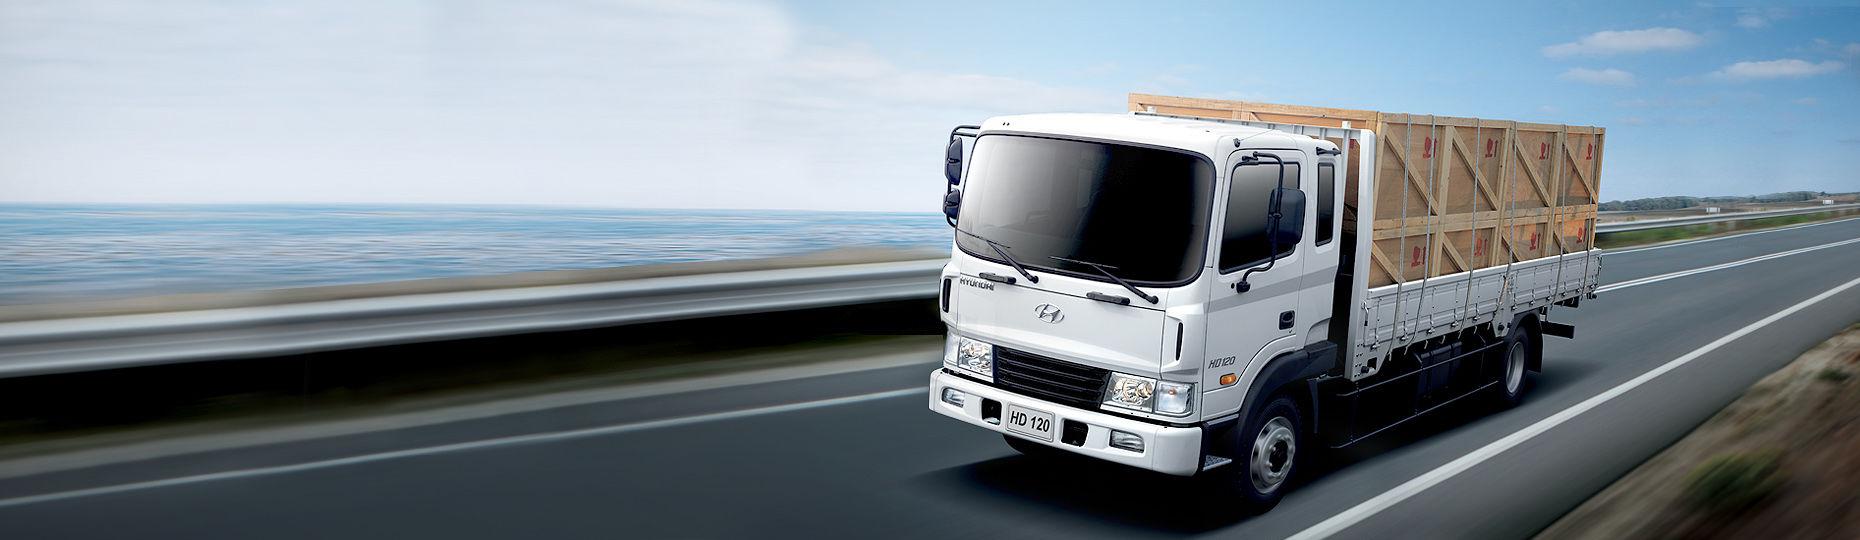 Hd120 Safety Trucks Hyundai Philippines Hd65 Wiring Diagram